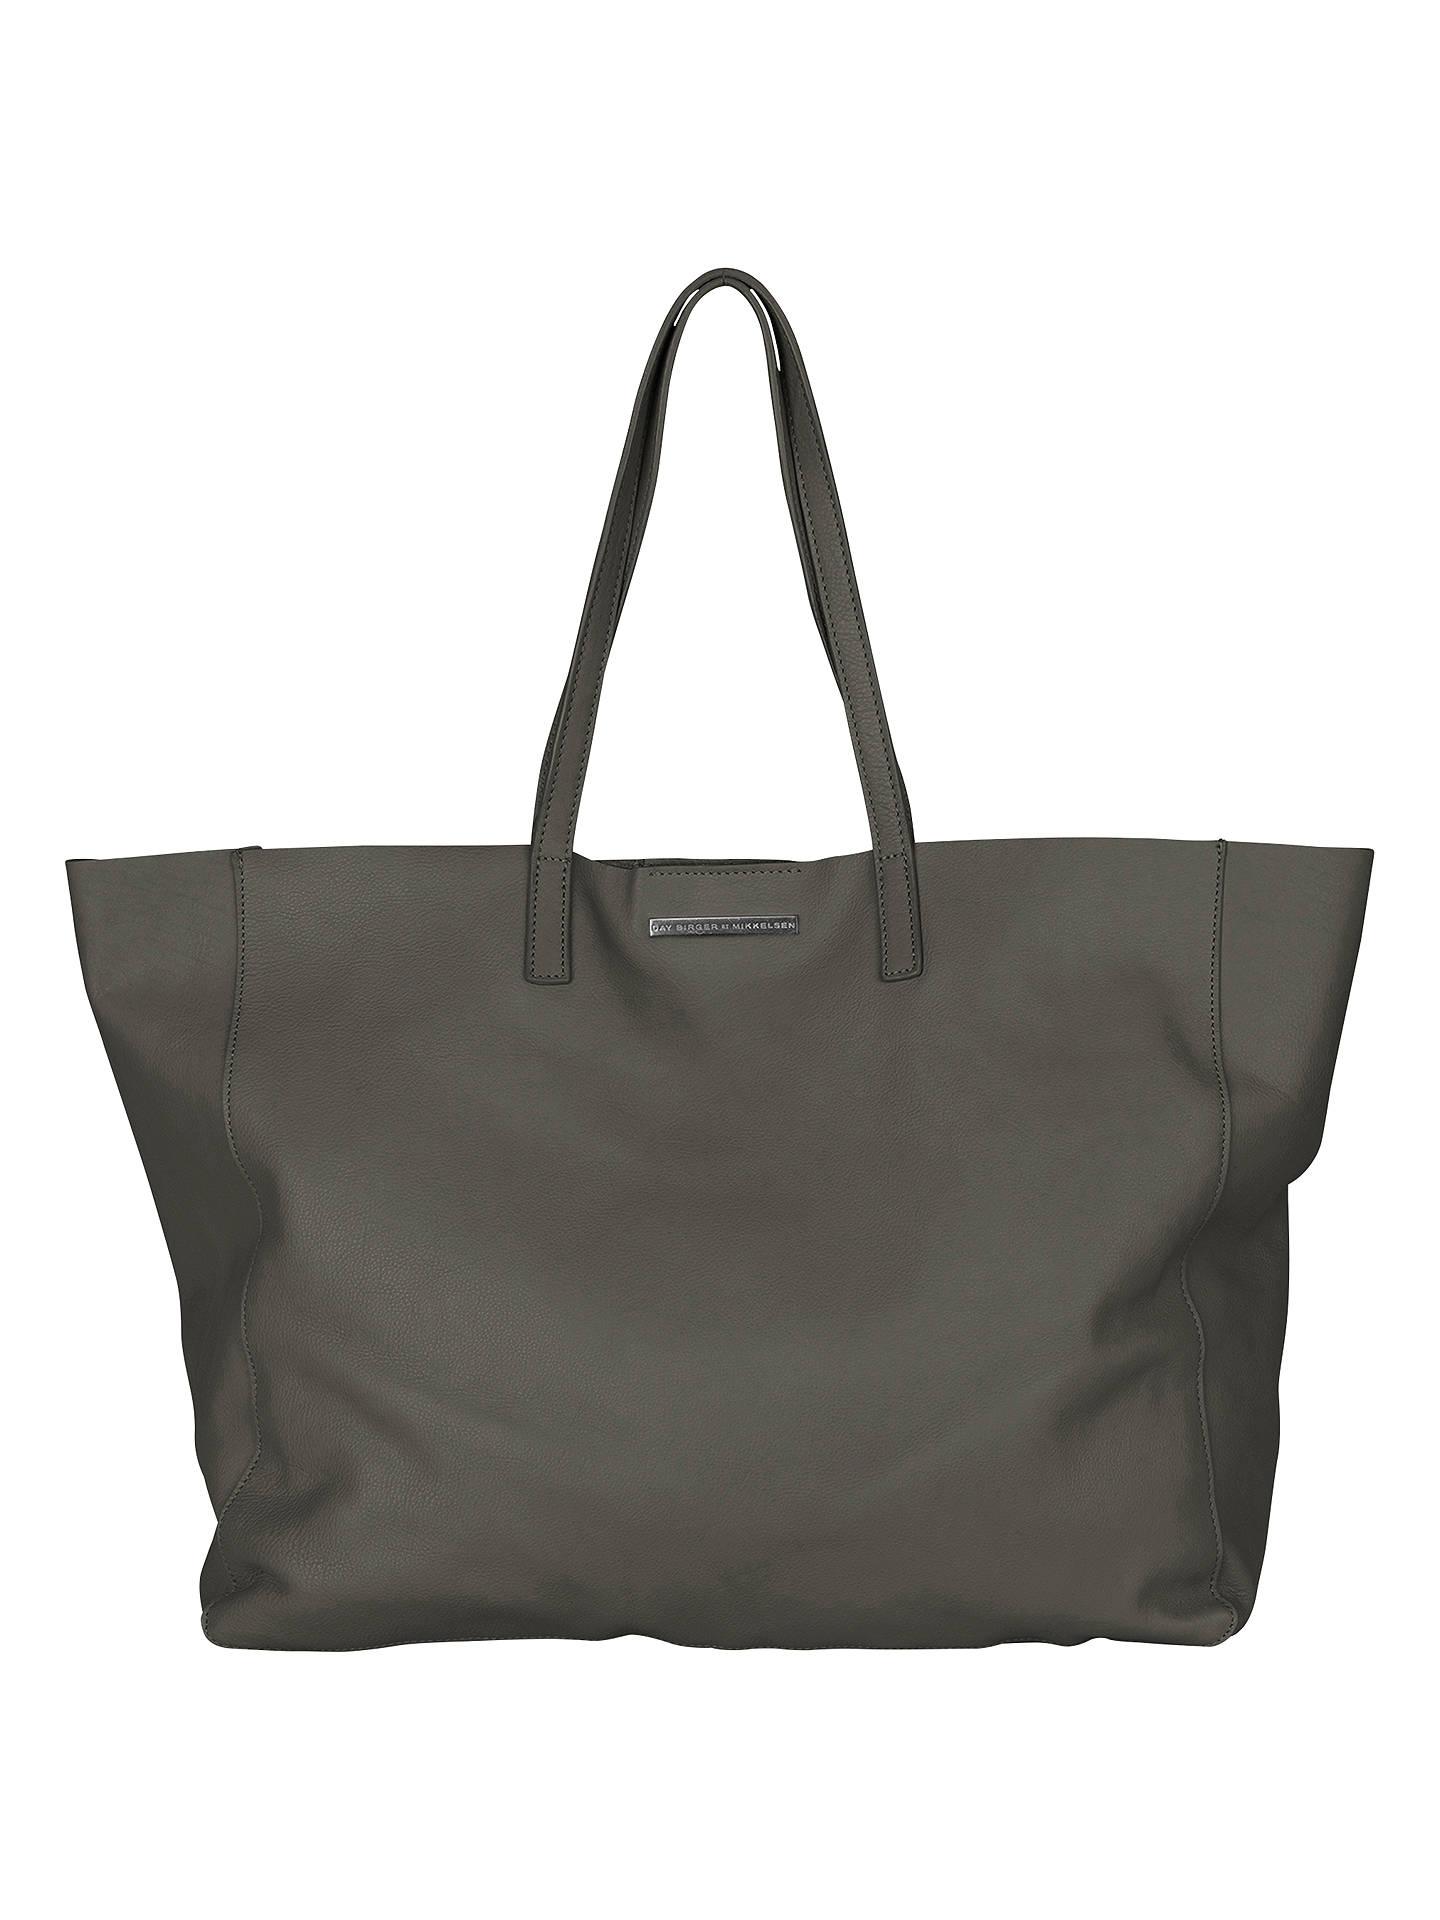 Et DAY Birger et Mikkelsen It Leather Shopper Bag at John Lewis ... 544aa50a5